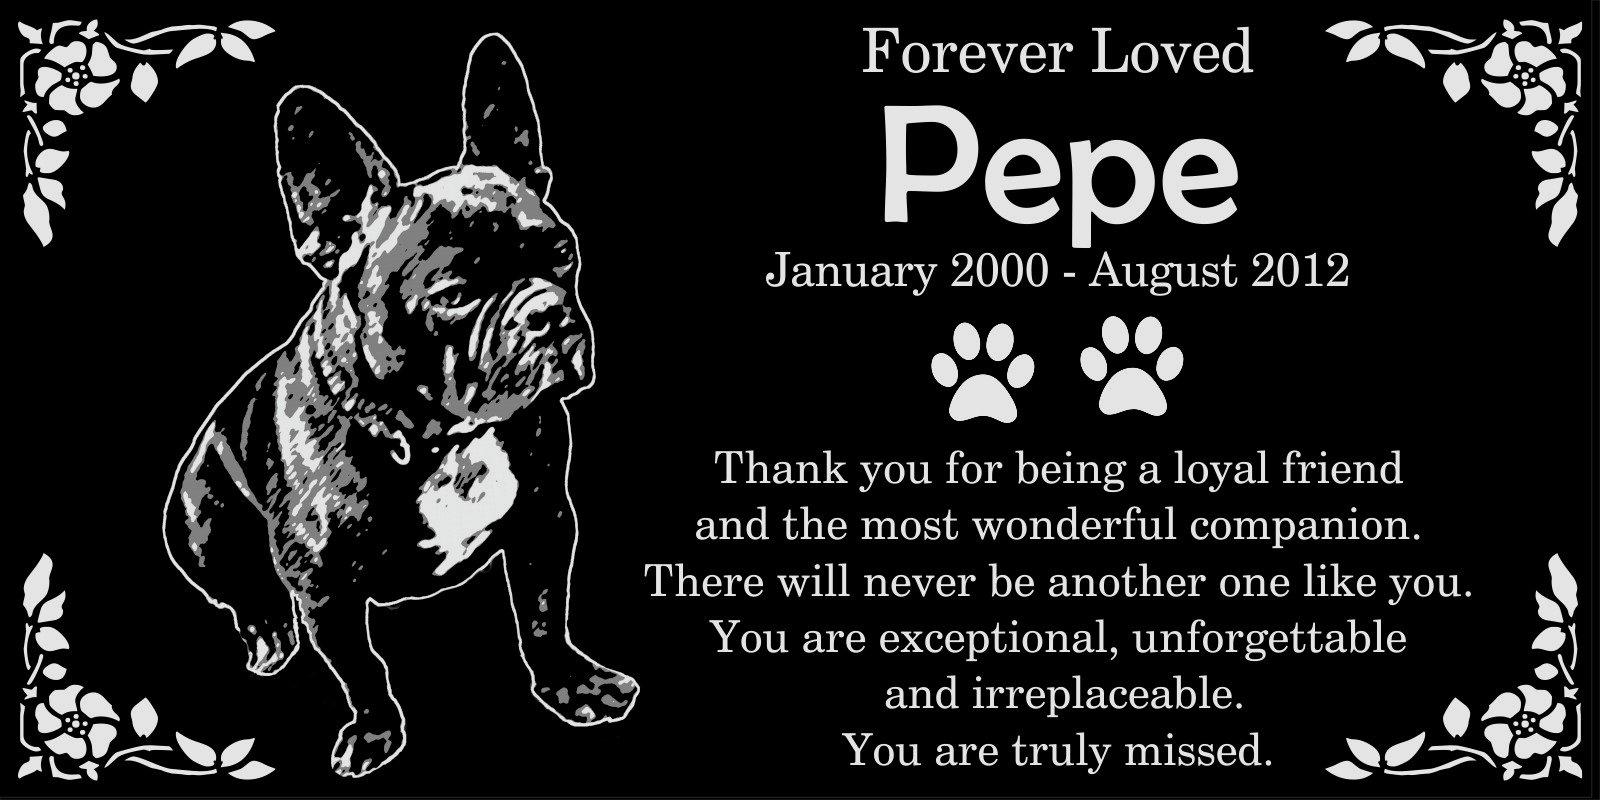 Personalized French Bulldog Pet Memorial 12''x6'' Engraved Black Granite Grave Marker Head Stone Plaque PEP1